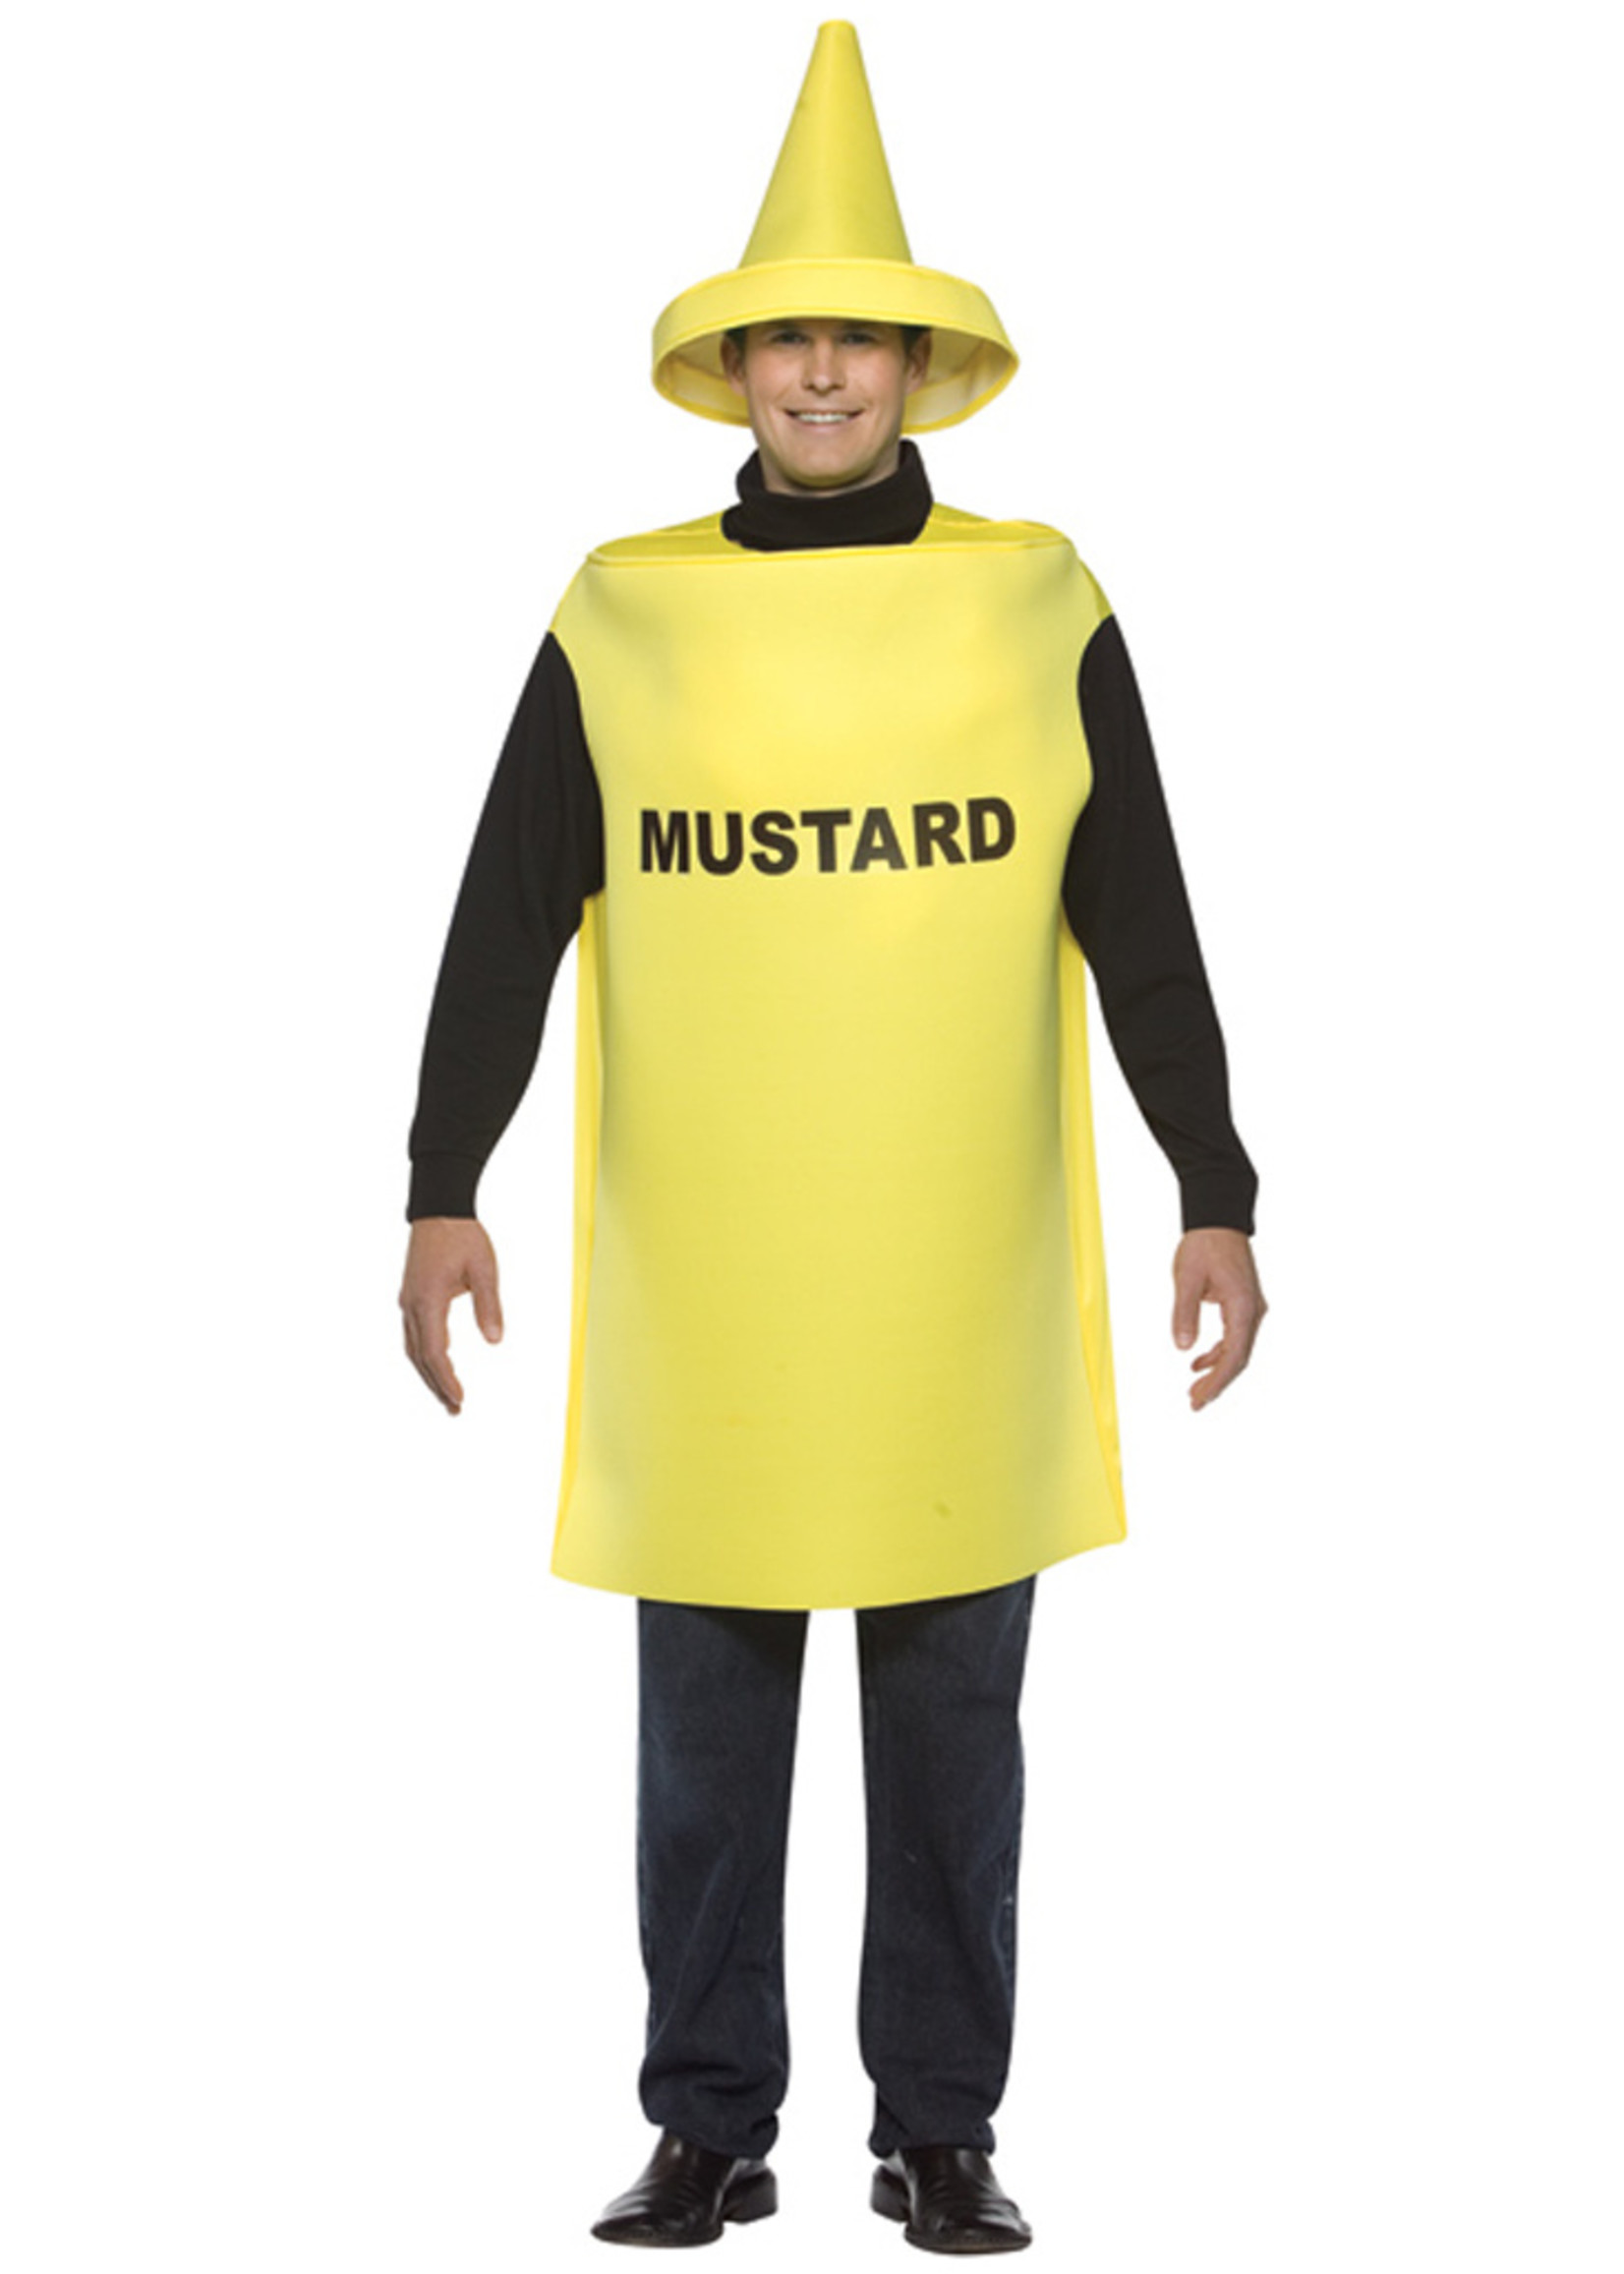 Mustard Costume - Humor